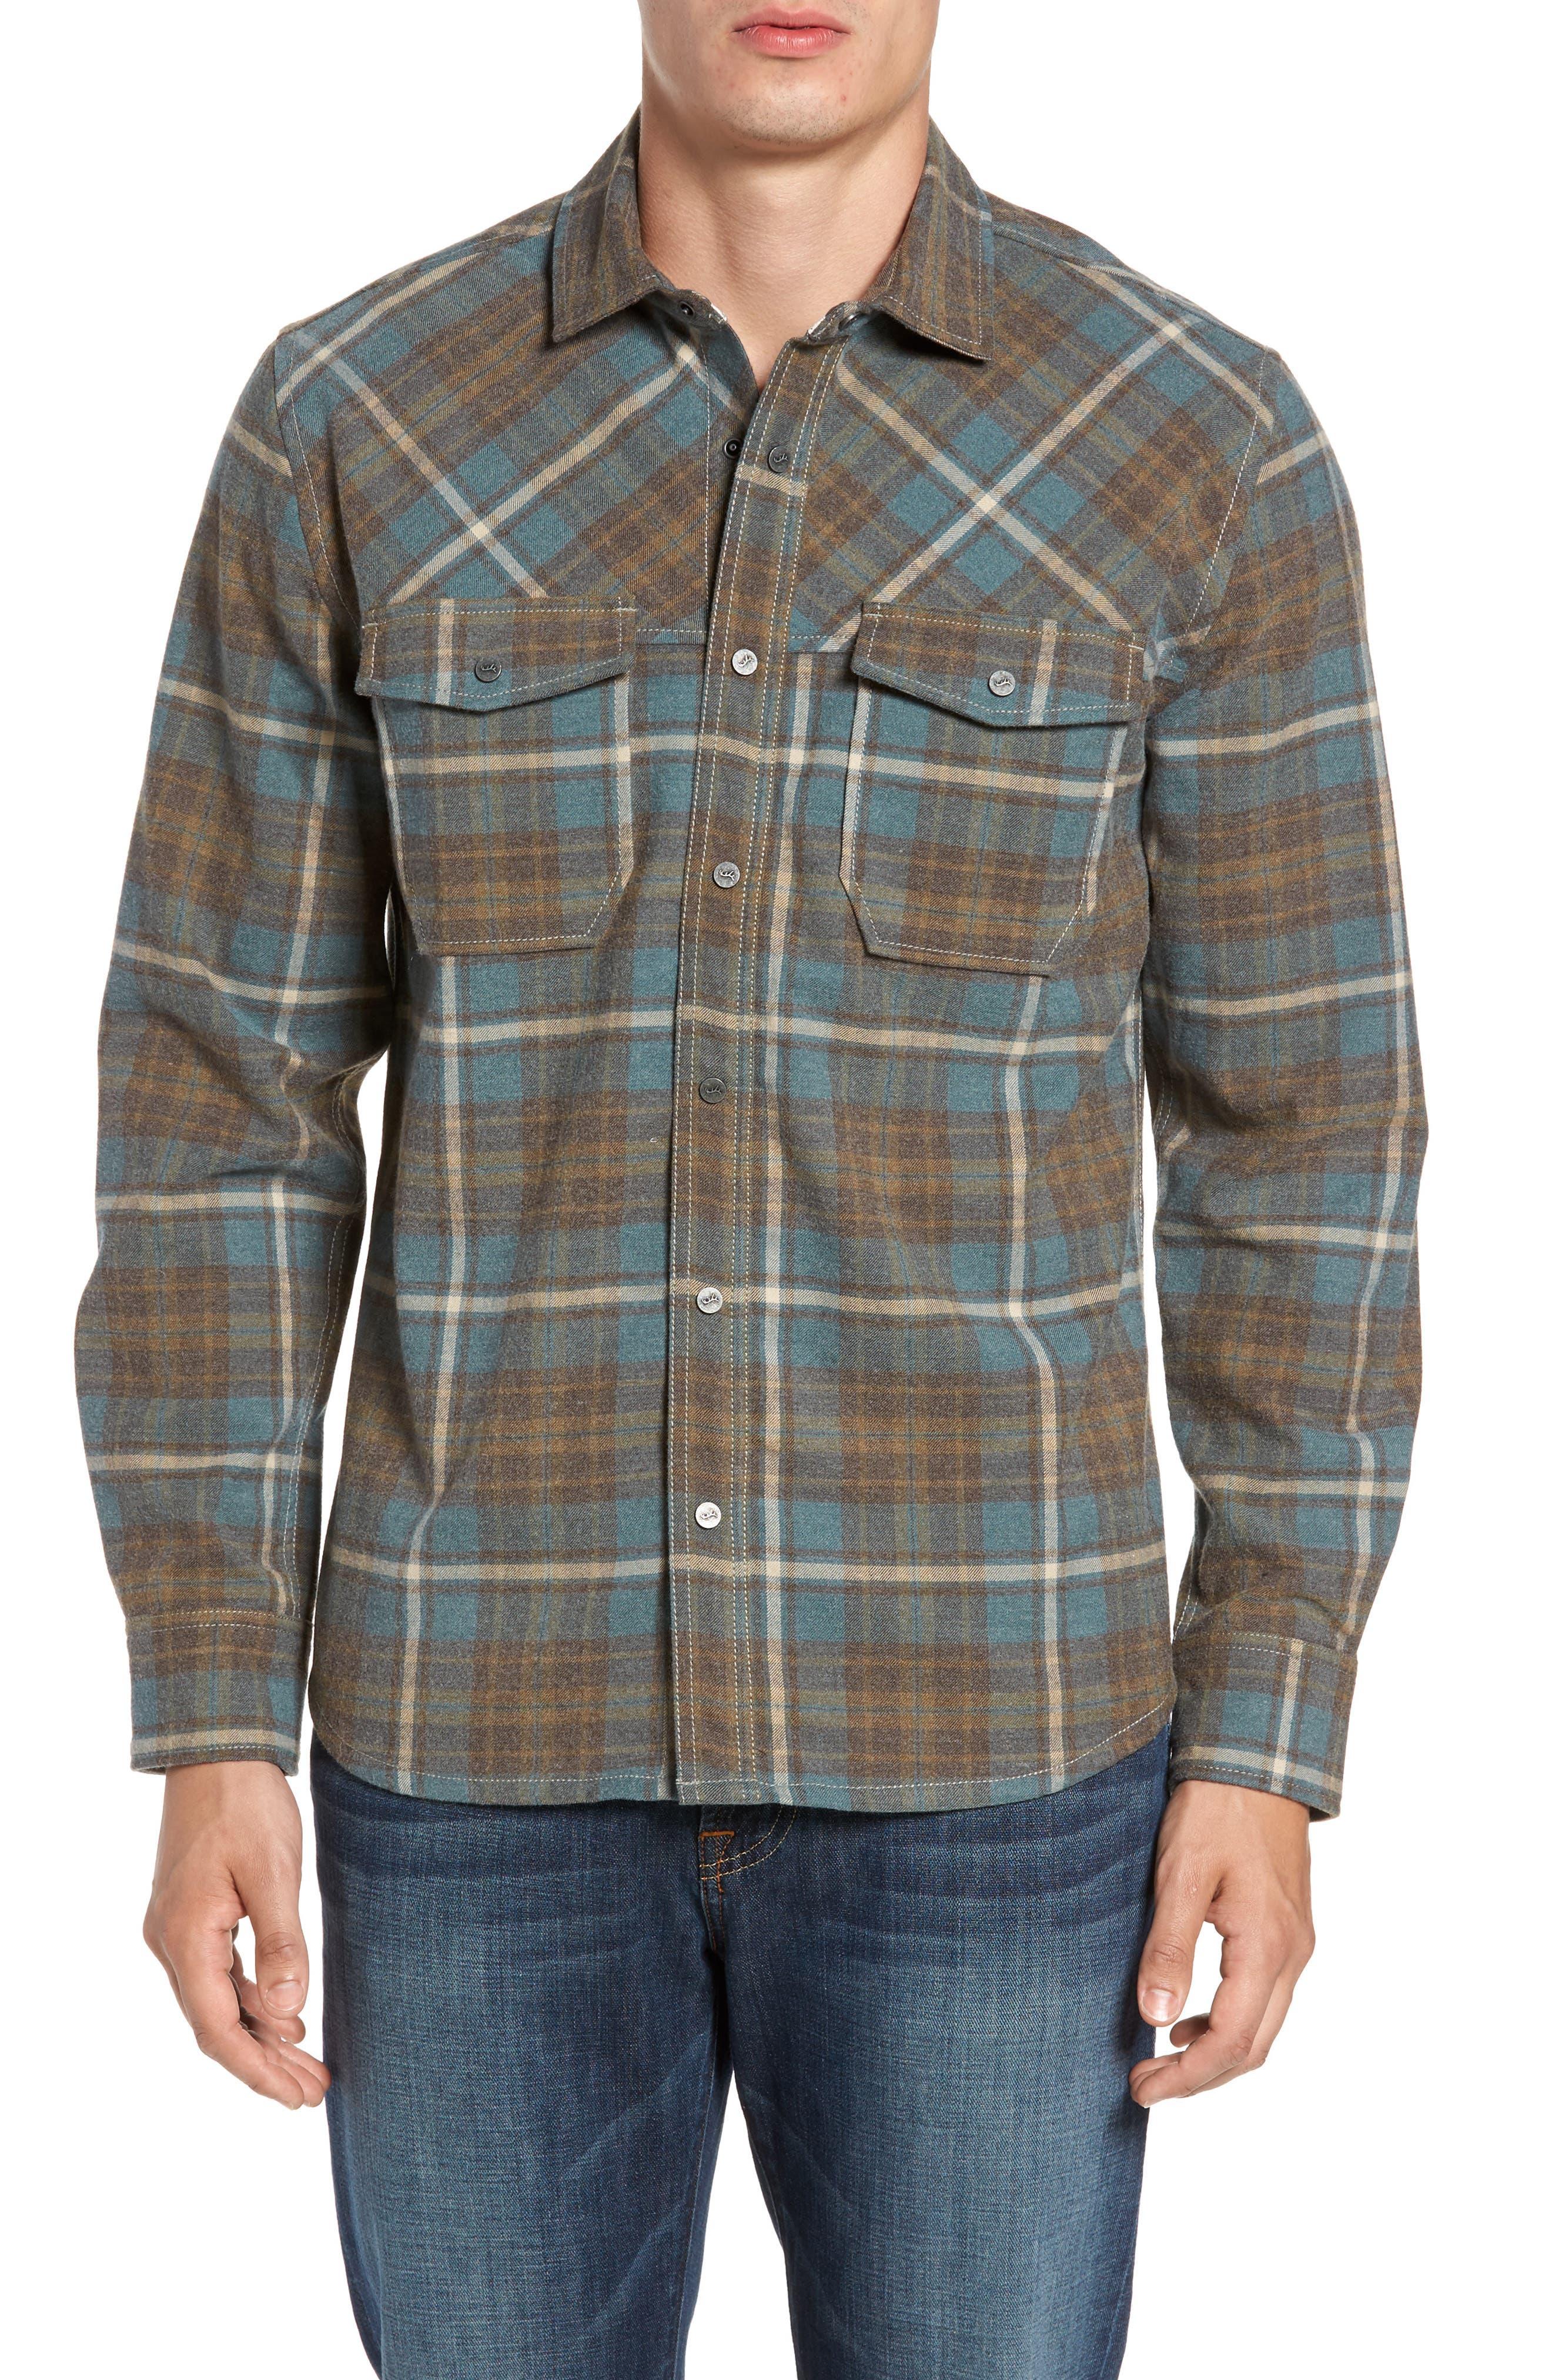 Alternate Image 1 Selected - Jeremiah Ranger Plaid Shirt